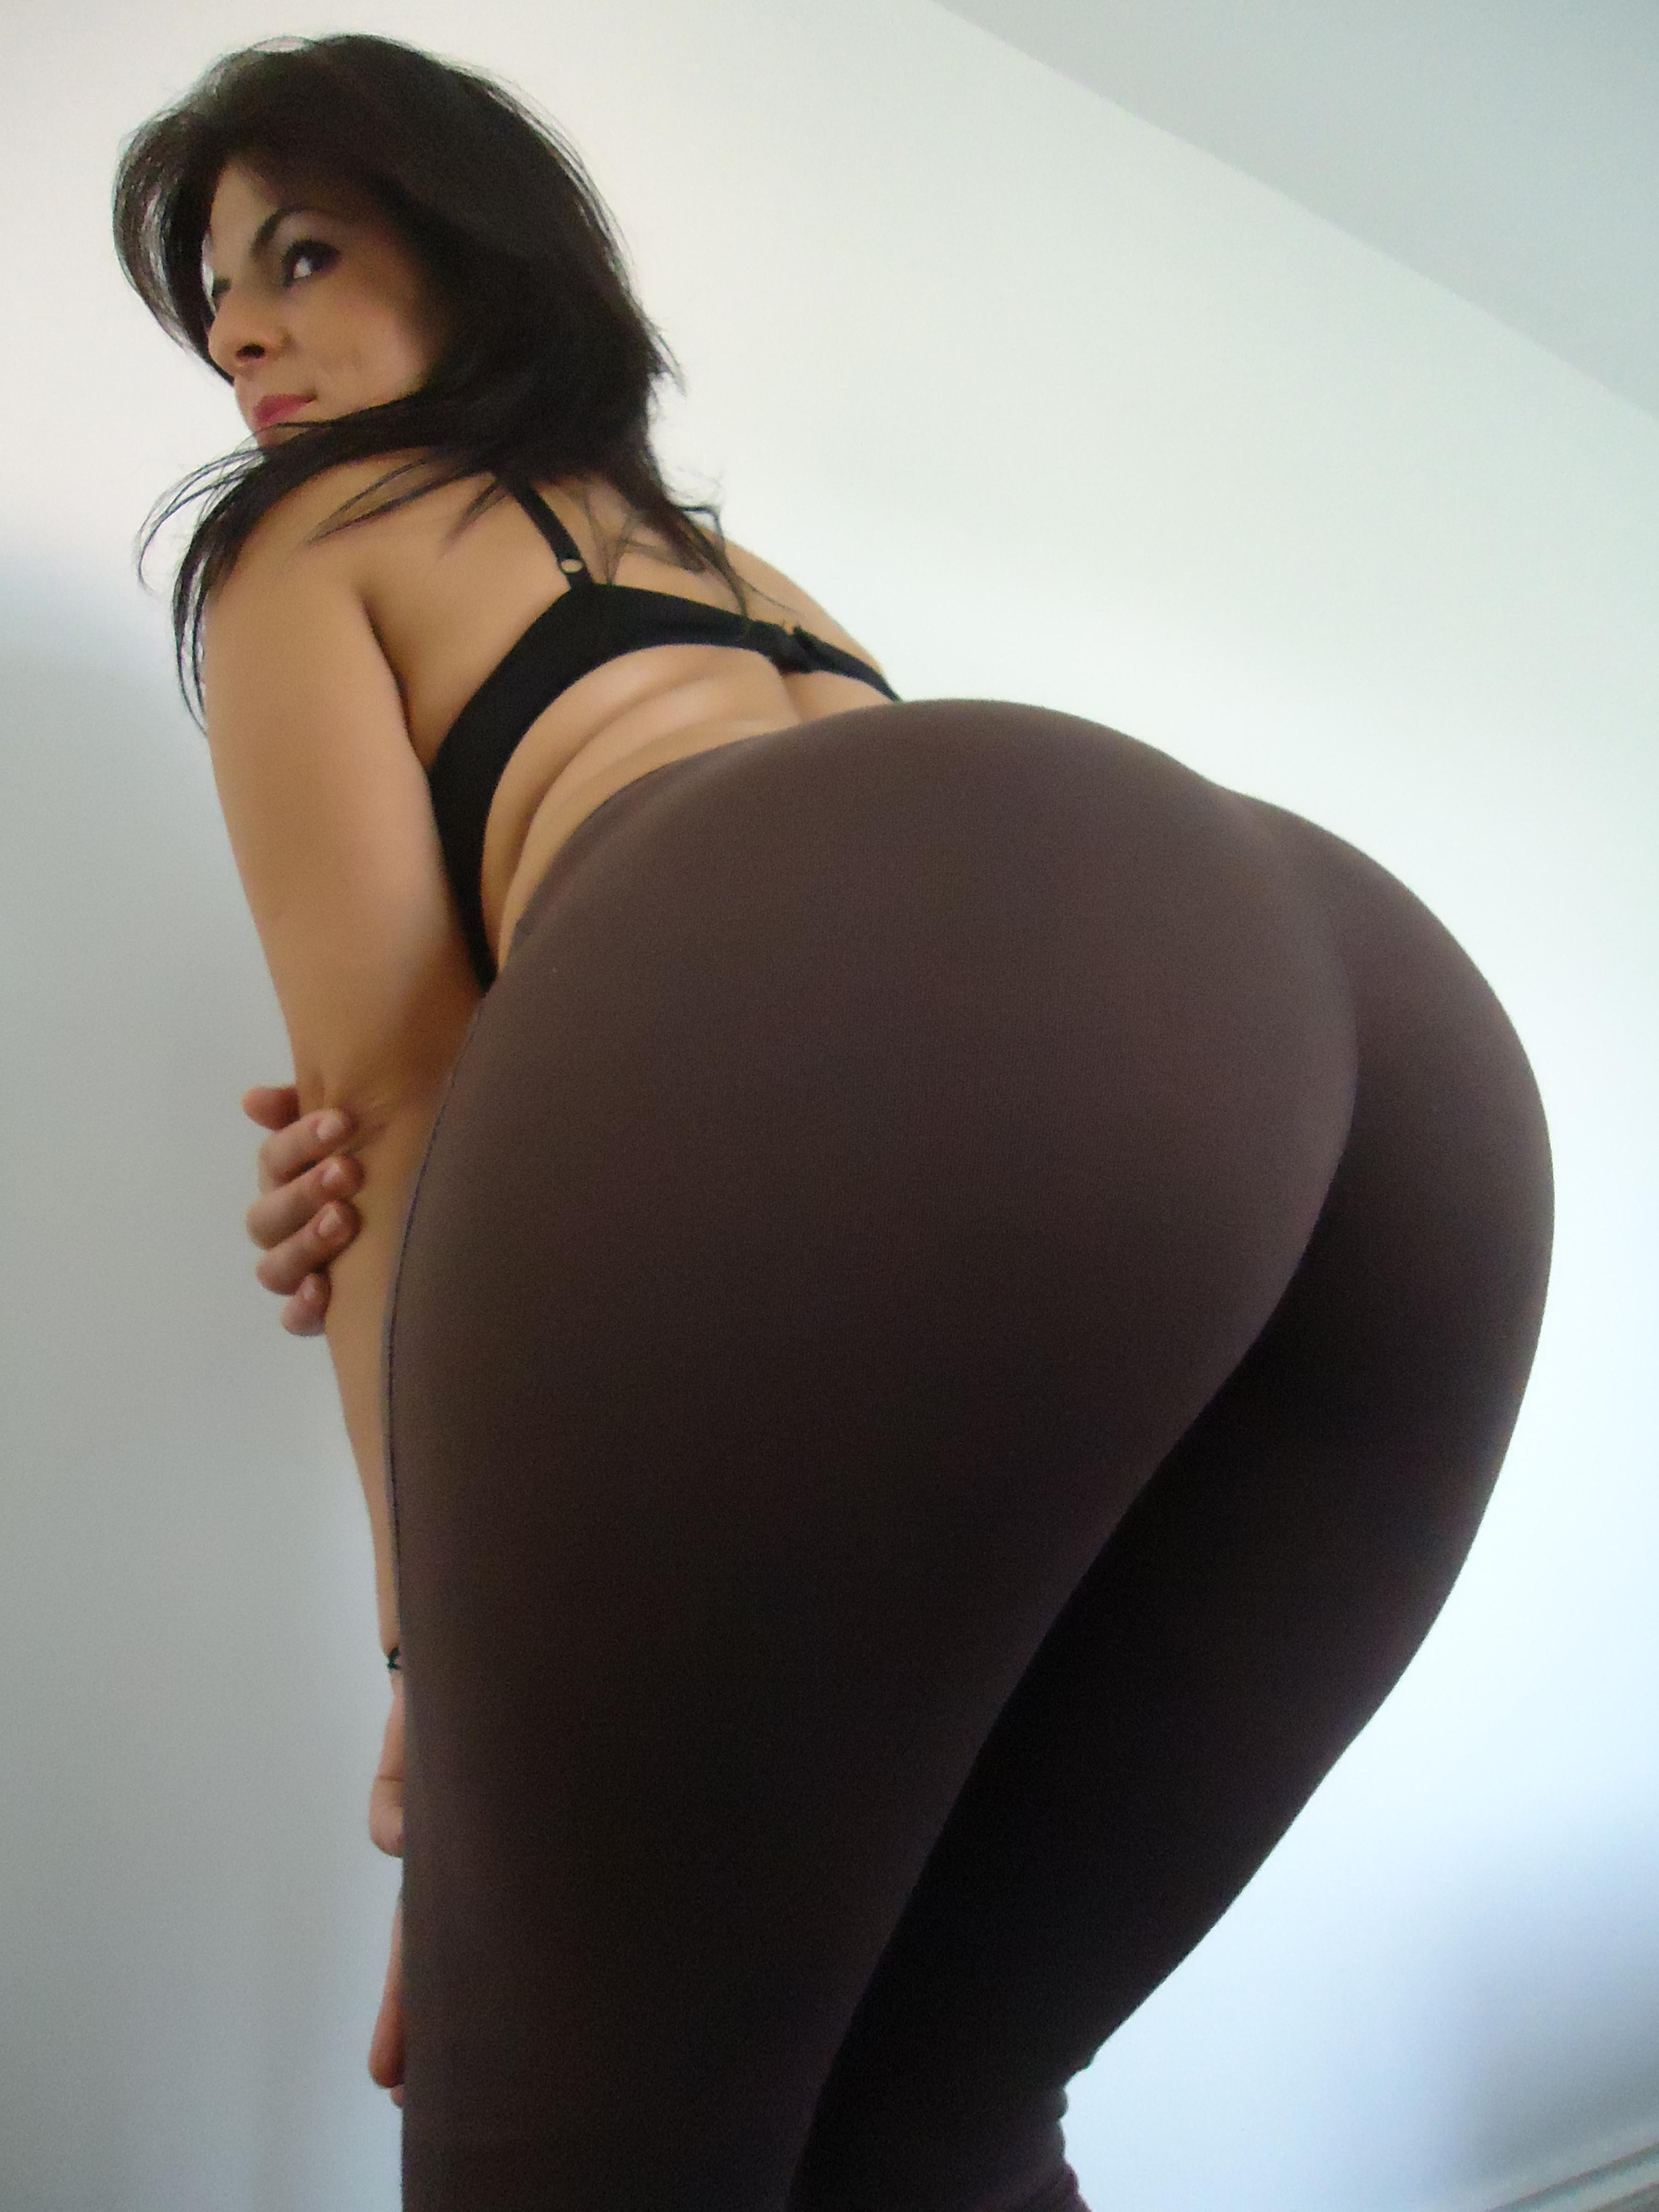 Big ass emage